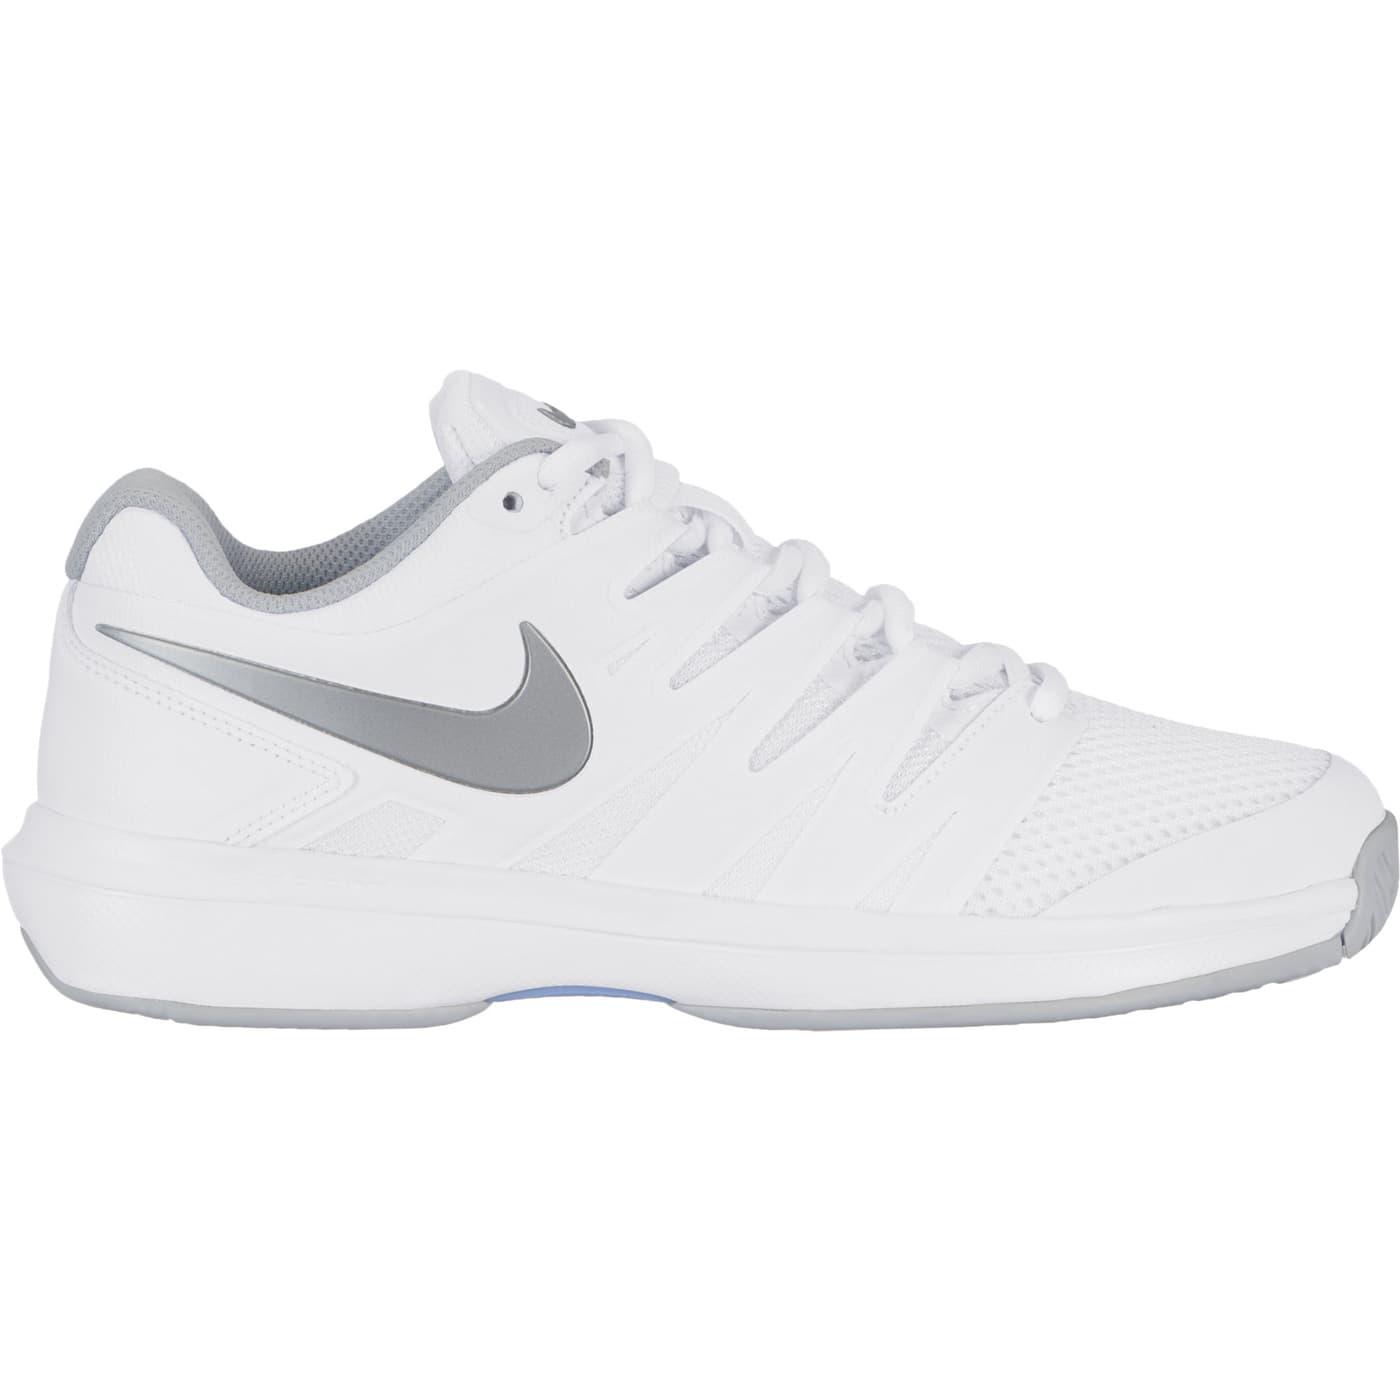 968ed43b70a Nike Air Zoom Vapor X Chaussures de tennis pour femme ...